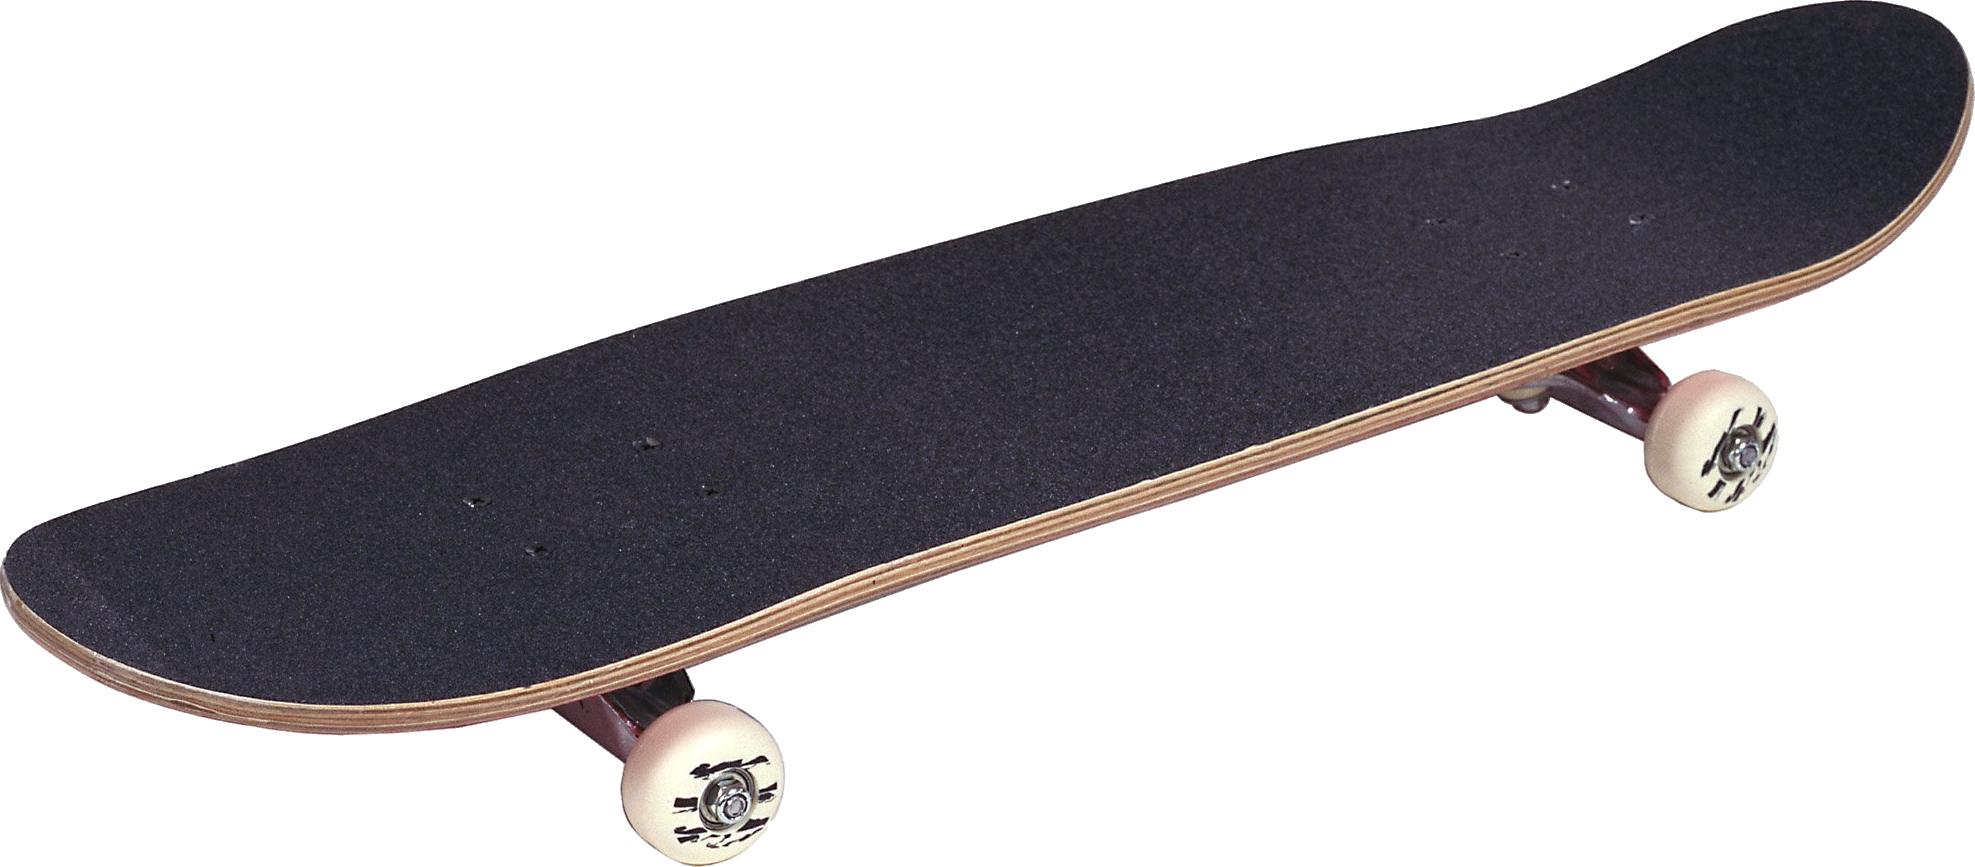 Skateboard HD PNG - 94093